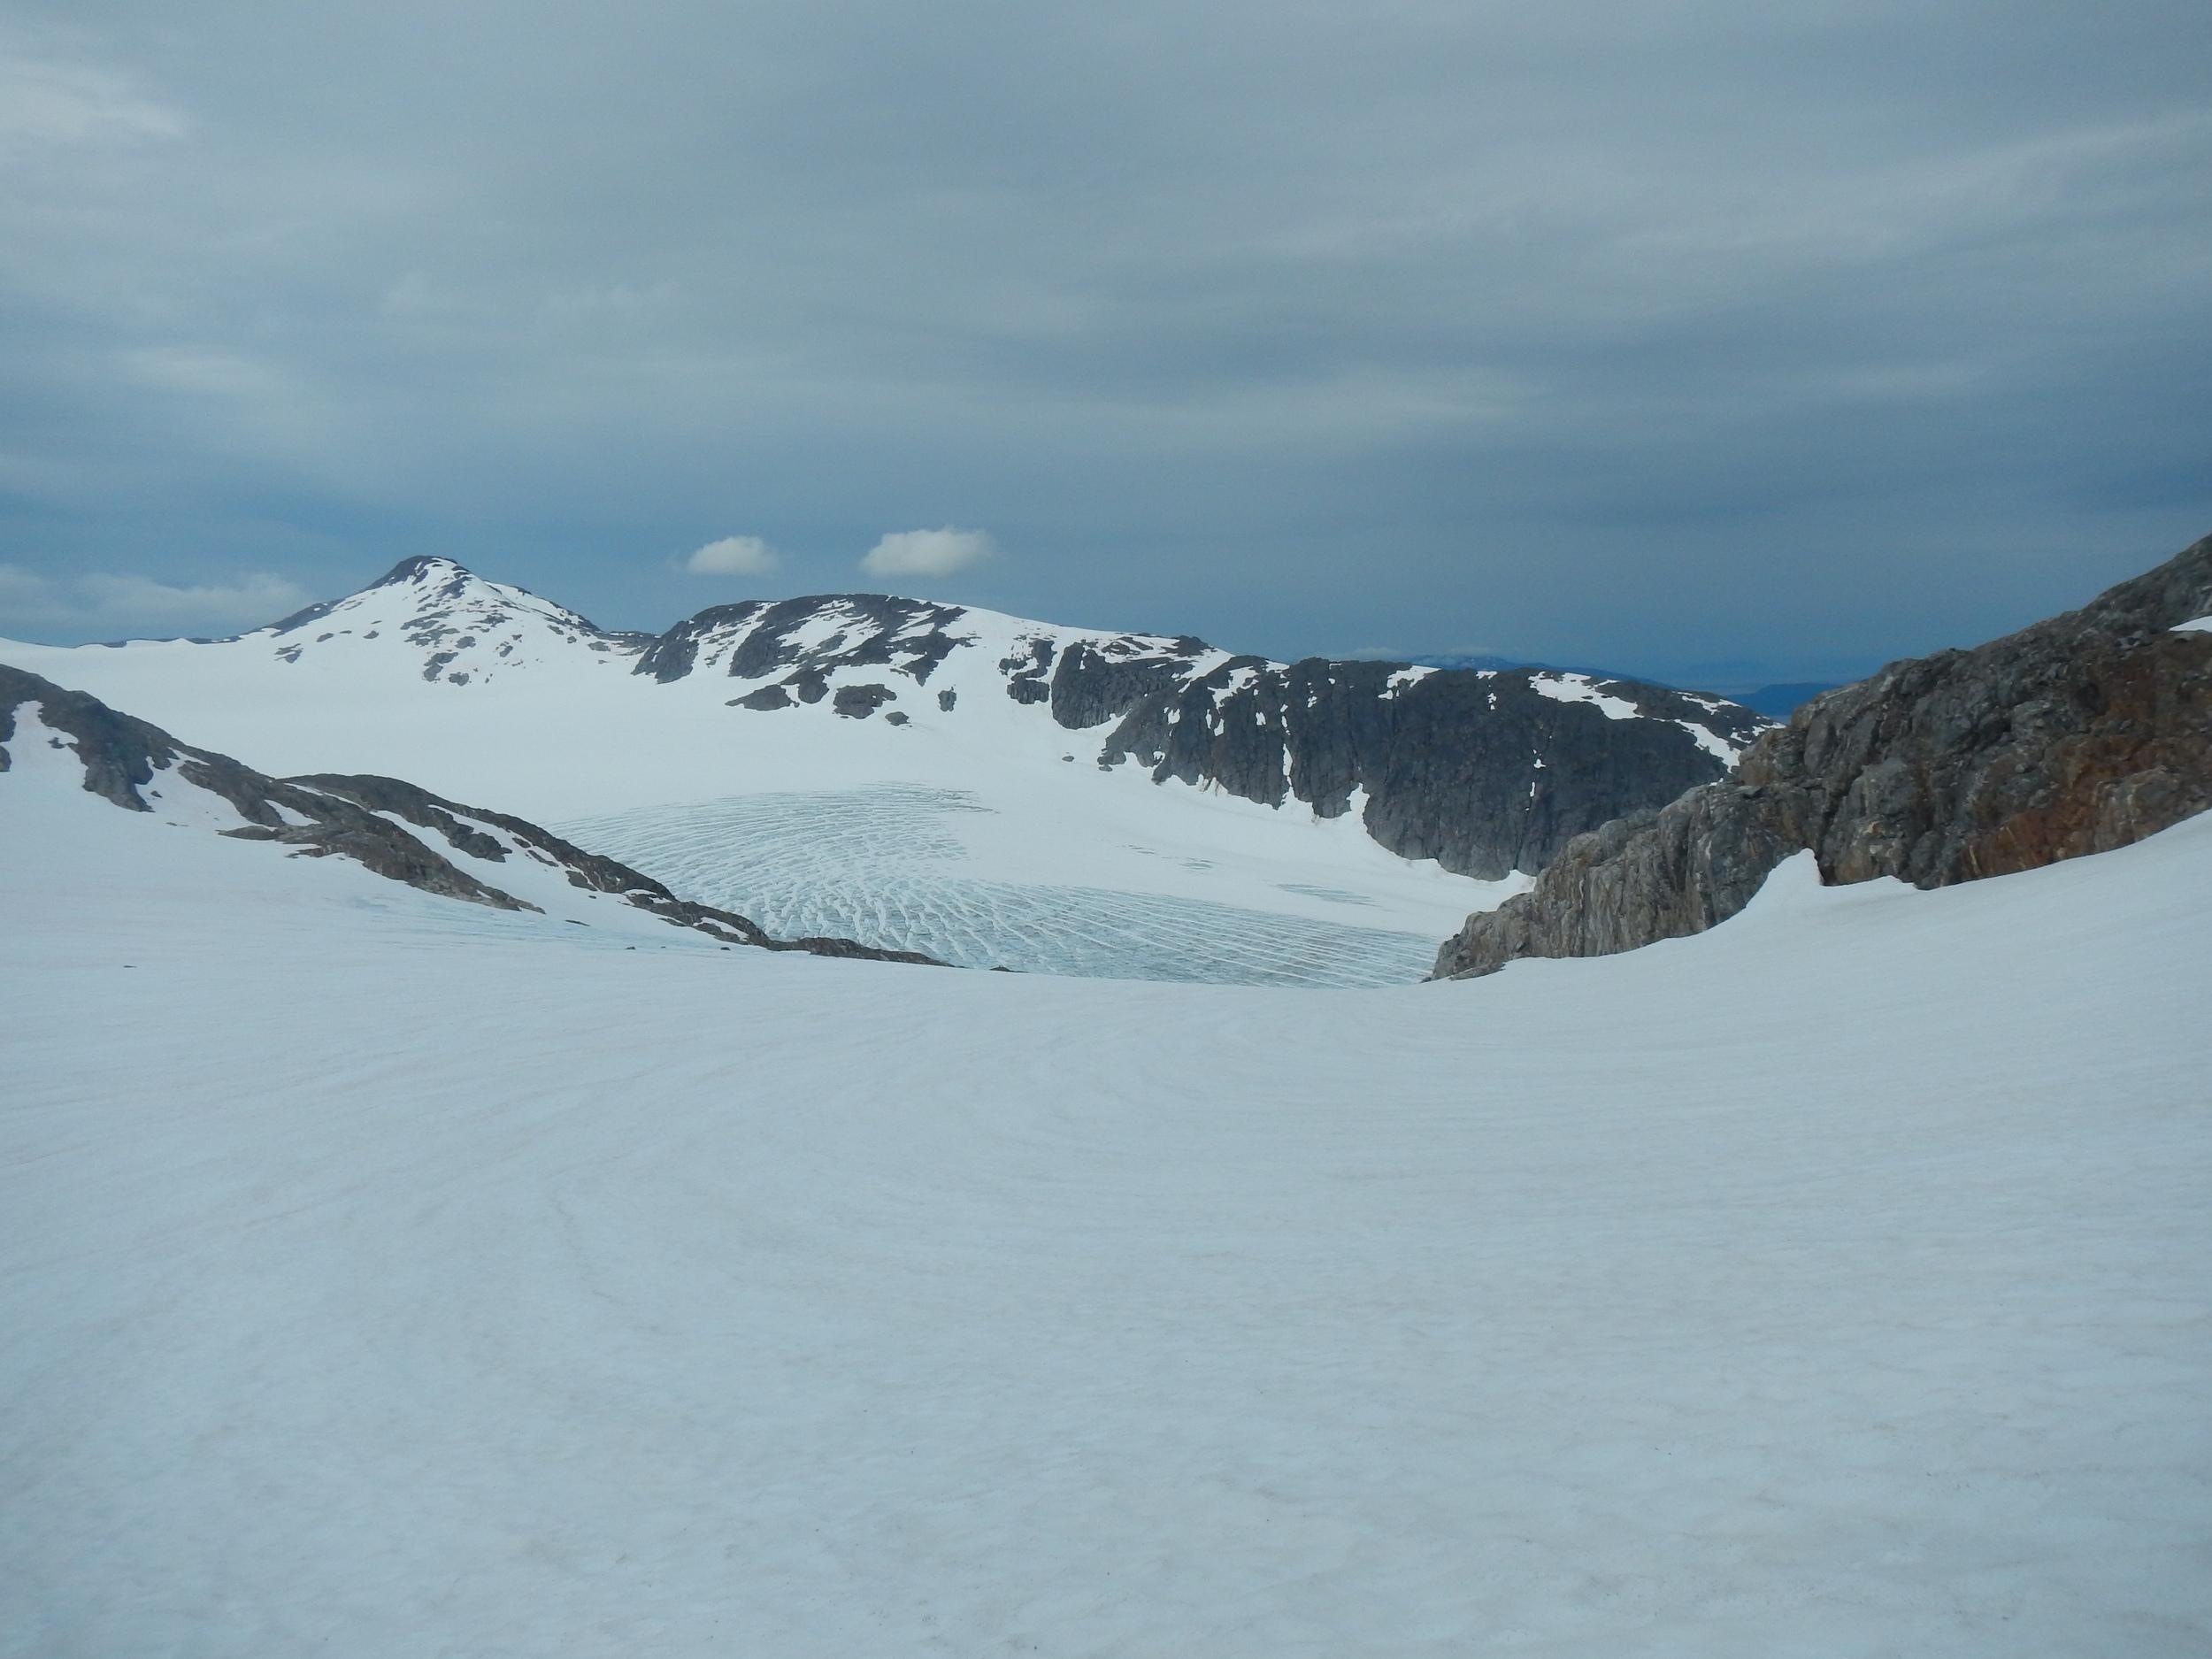 Looking back on the Lemon Creek glacier. Photo by Elizabeth Kenny